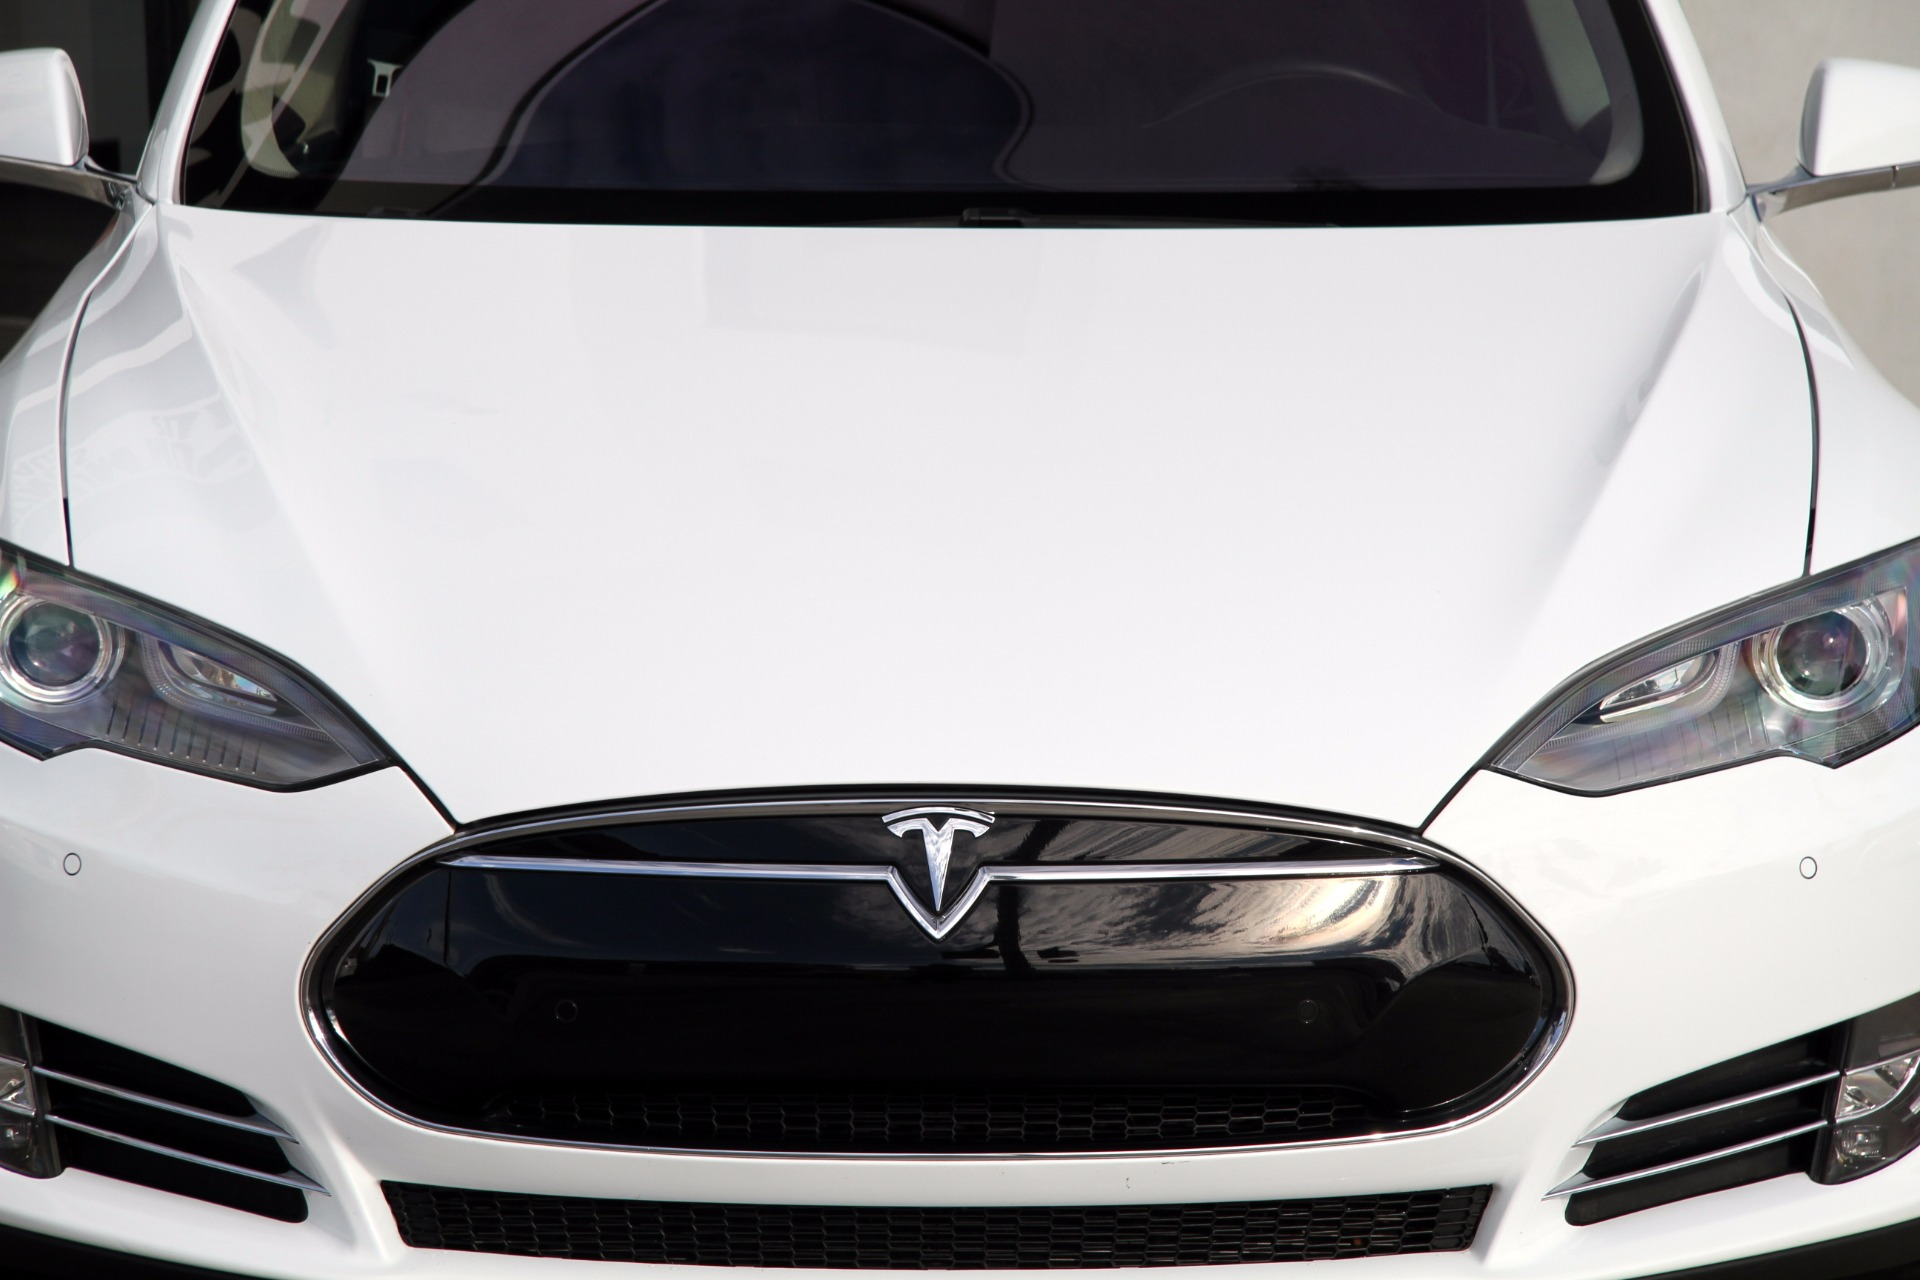 2013 Tesla Model S Performance P85 Msrp 119620 Stock 6029